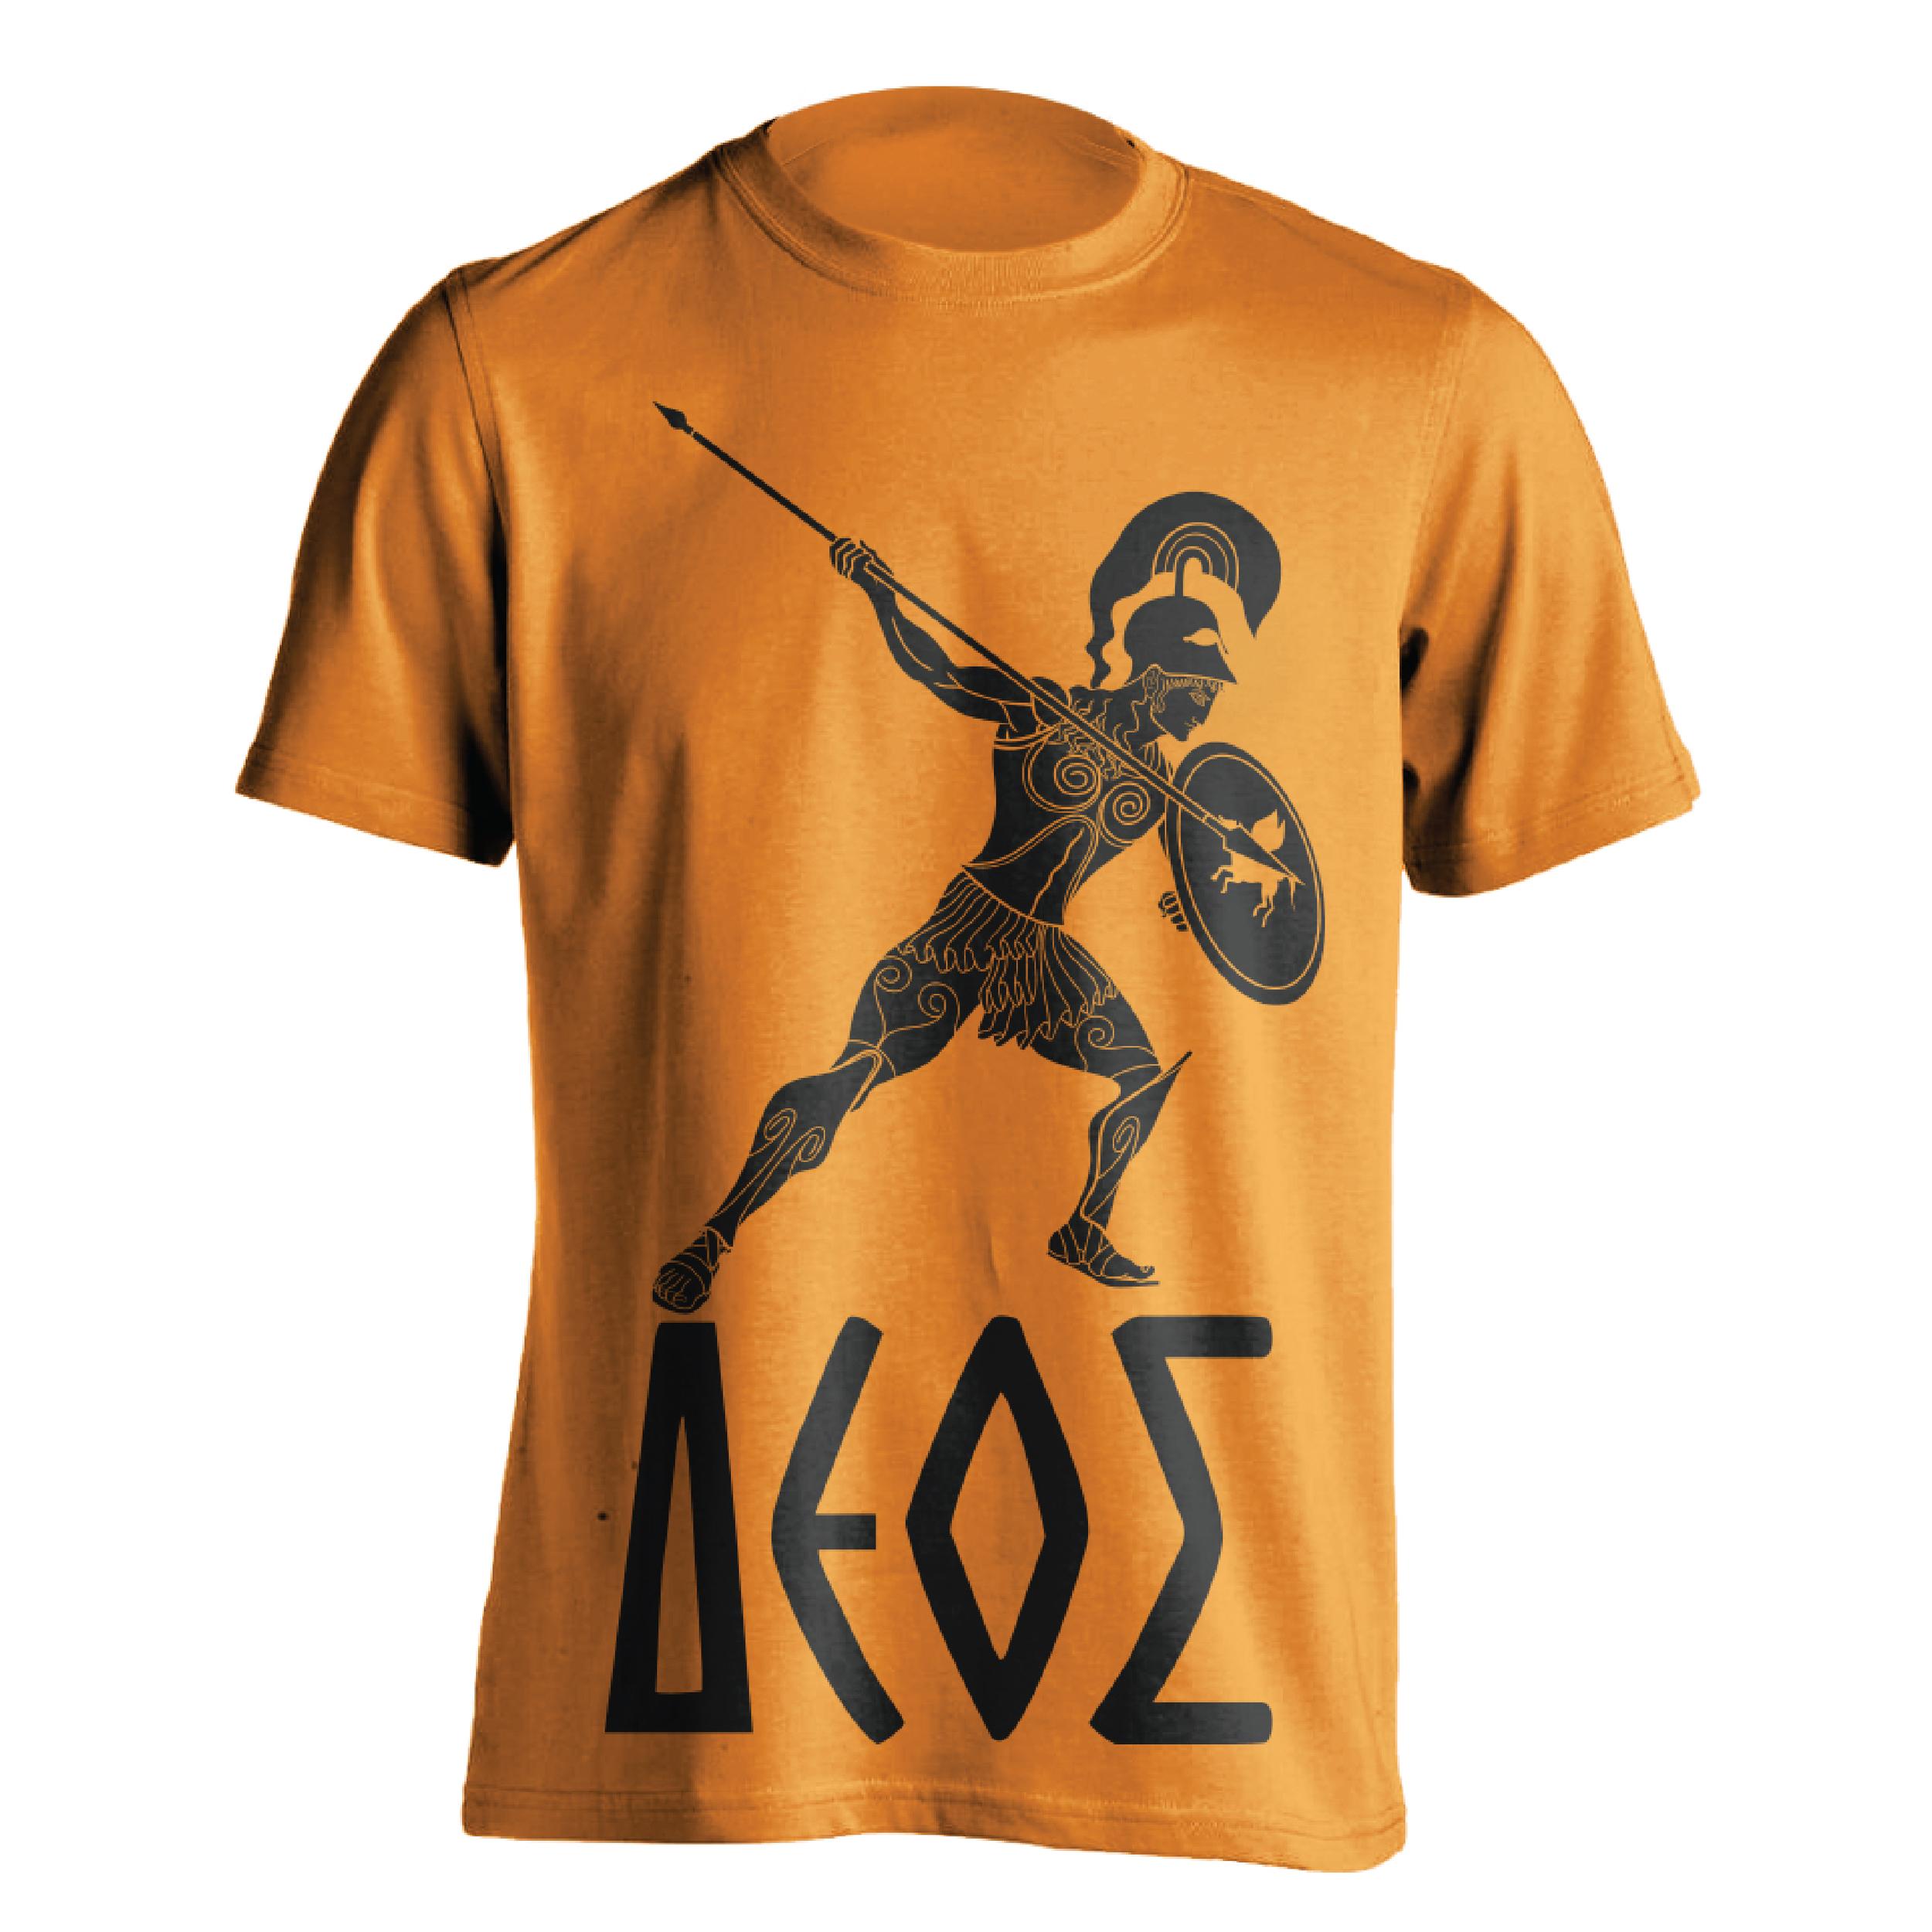 achilles-greek-raskol-apparel-orozco-design-studio-robertoorozco-artist-orange-black-shirt-homer-spear-shield-theos-mythology-mythos-warrior-war-spartan-greece-athens-illustration-illustrator-adobe-vector-vector-art-digital-graphic-design.jpg